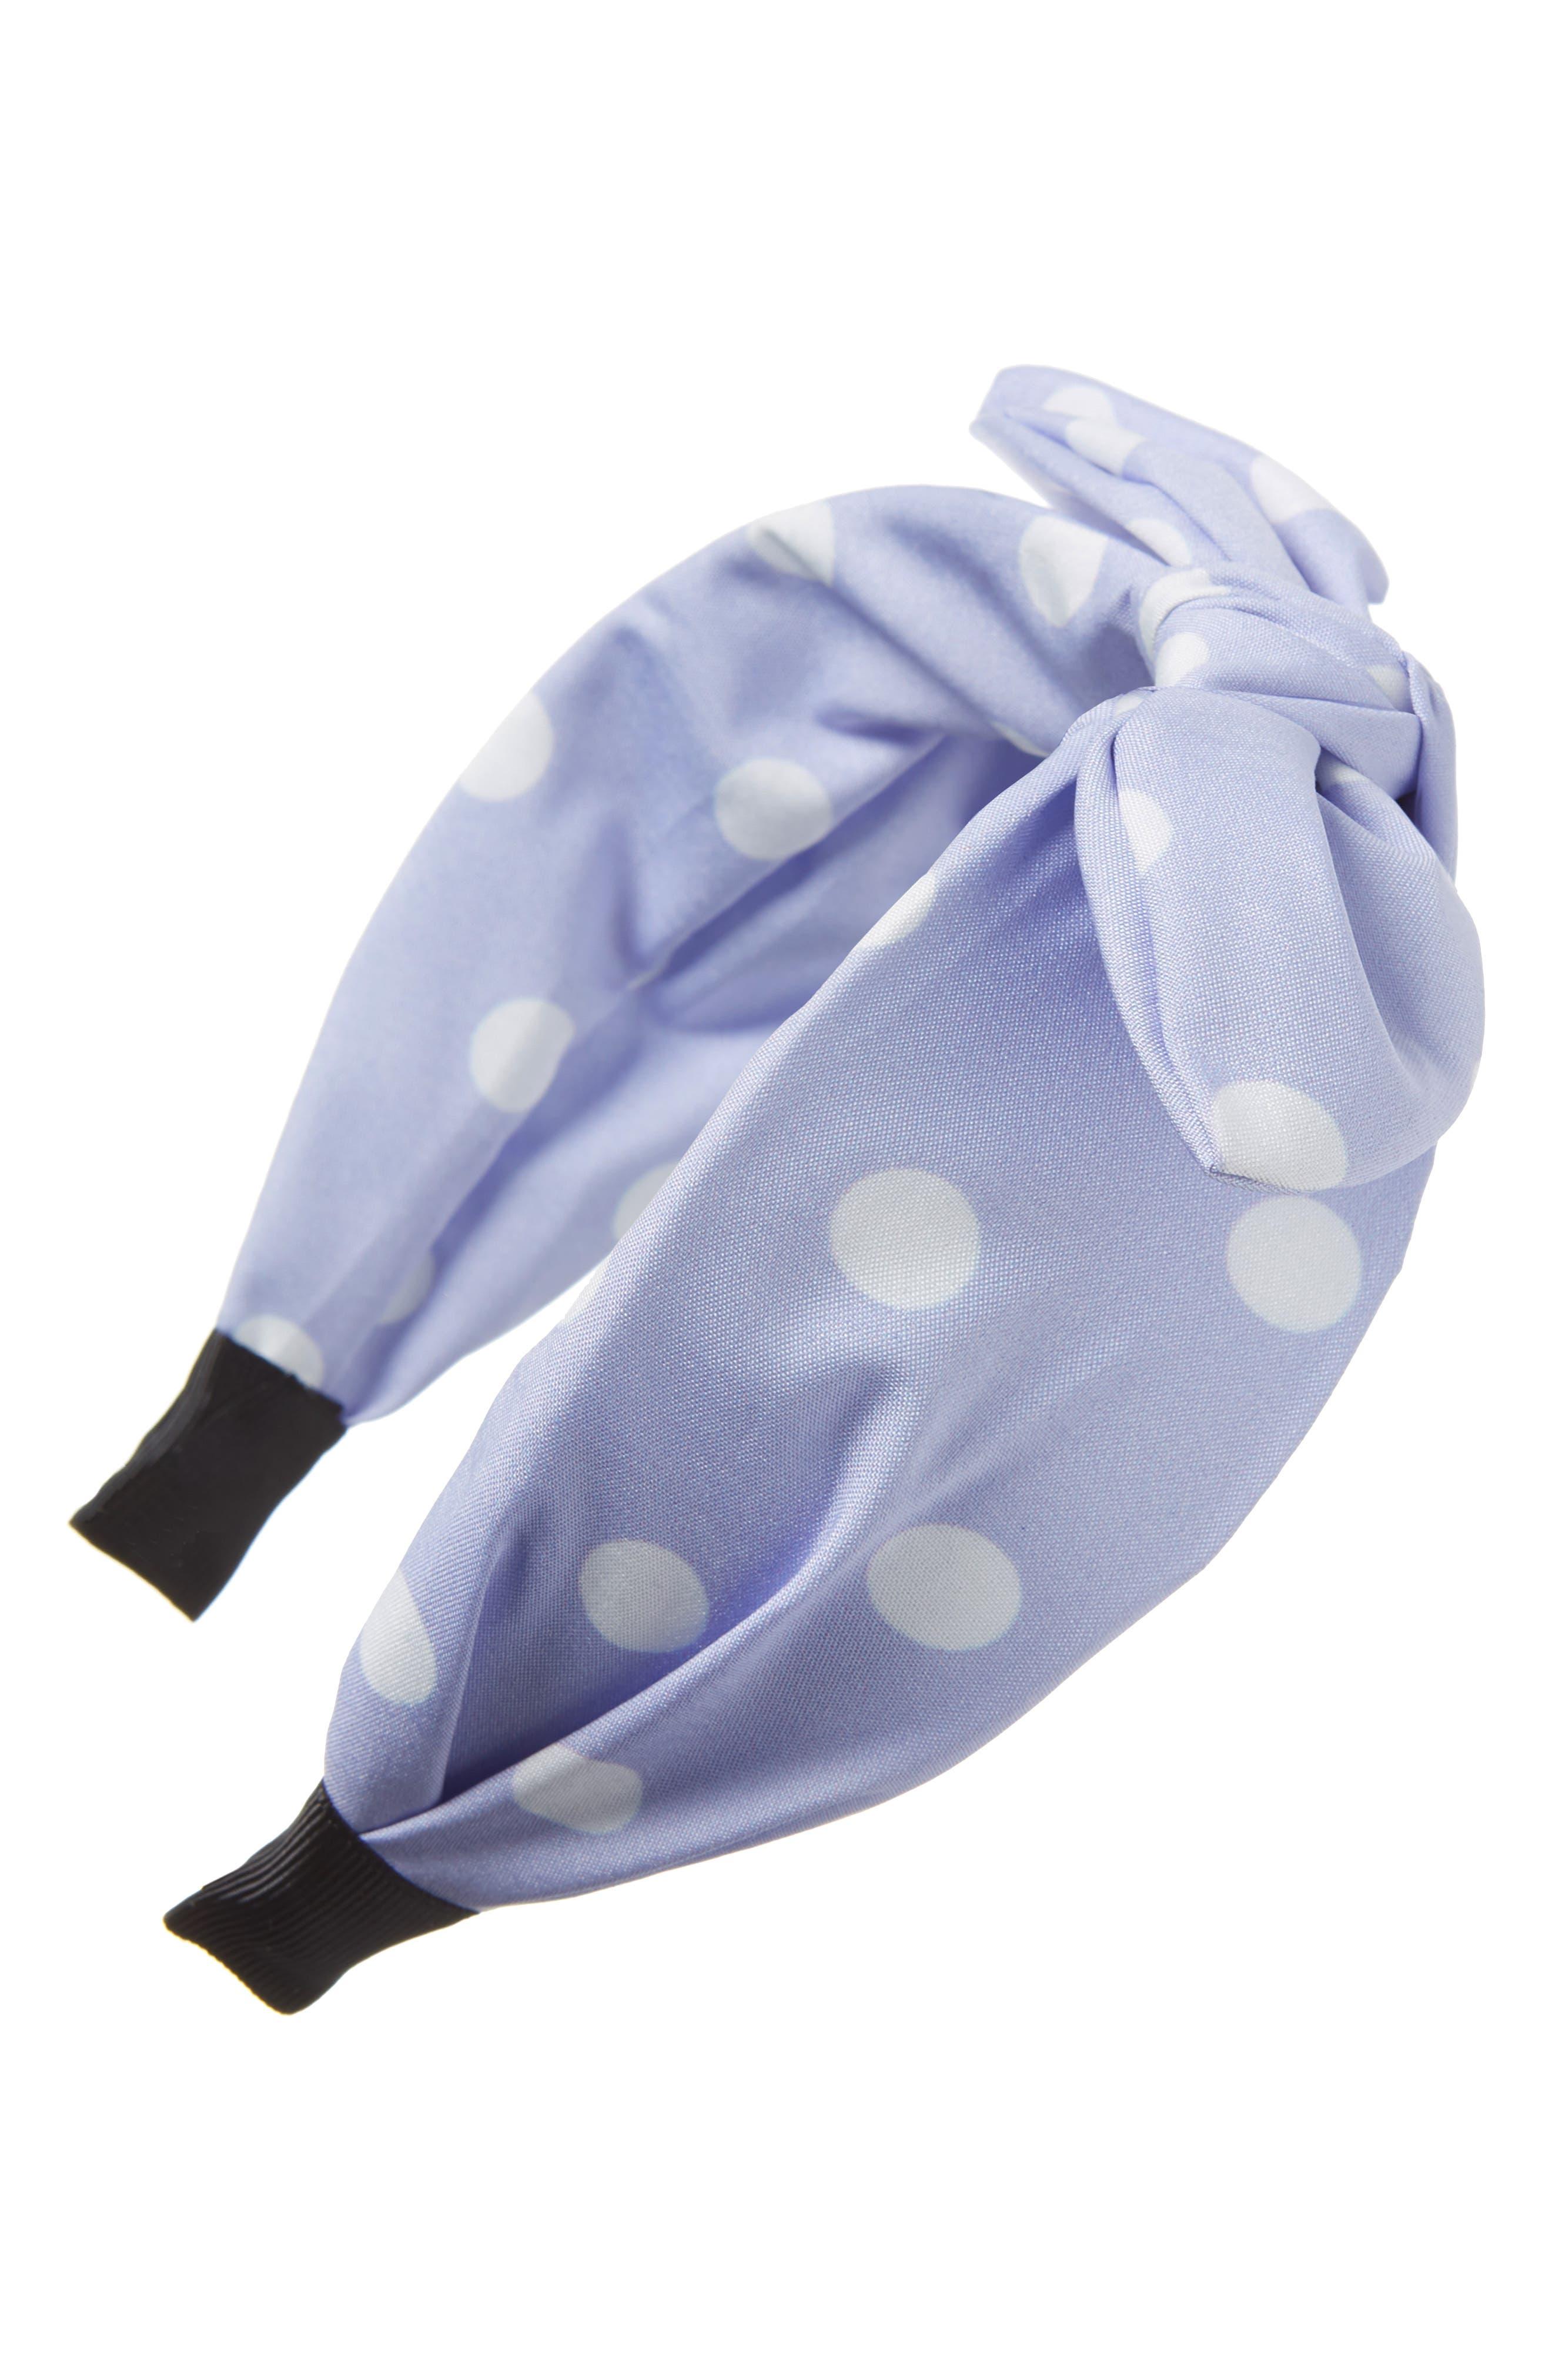 1950 Style Clothing- A Shopping Guide Tasha Polka Dot Bow Headband $24.00 AT vintagedancer.com